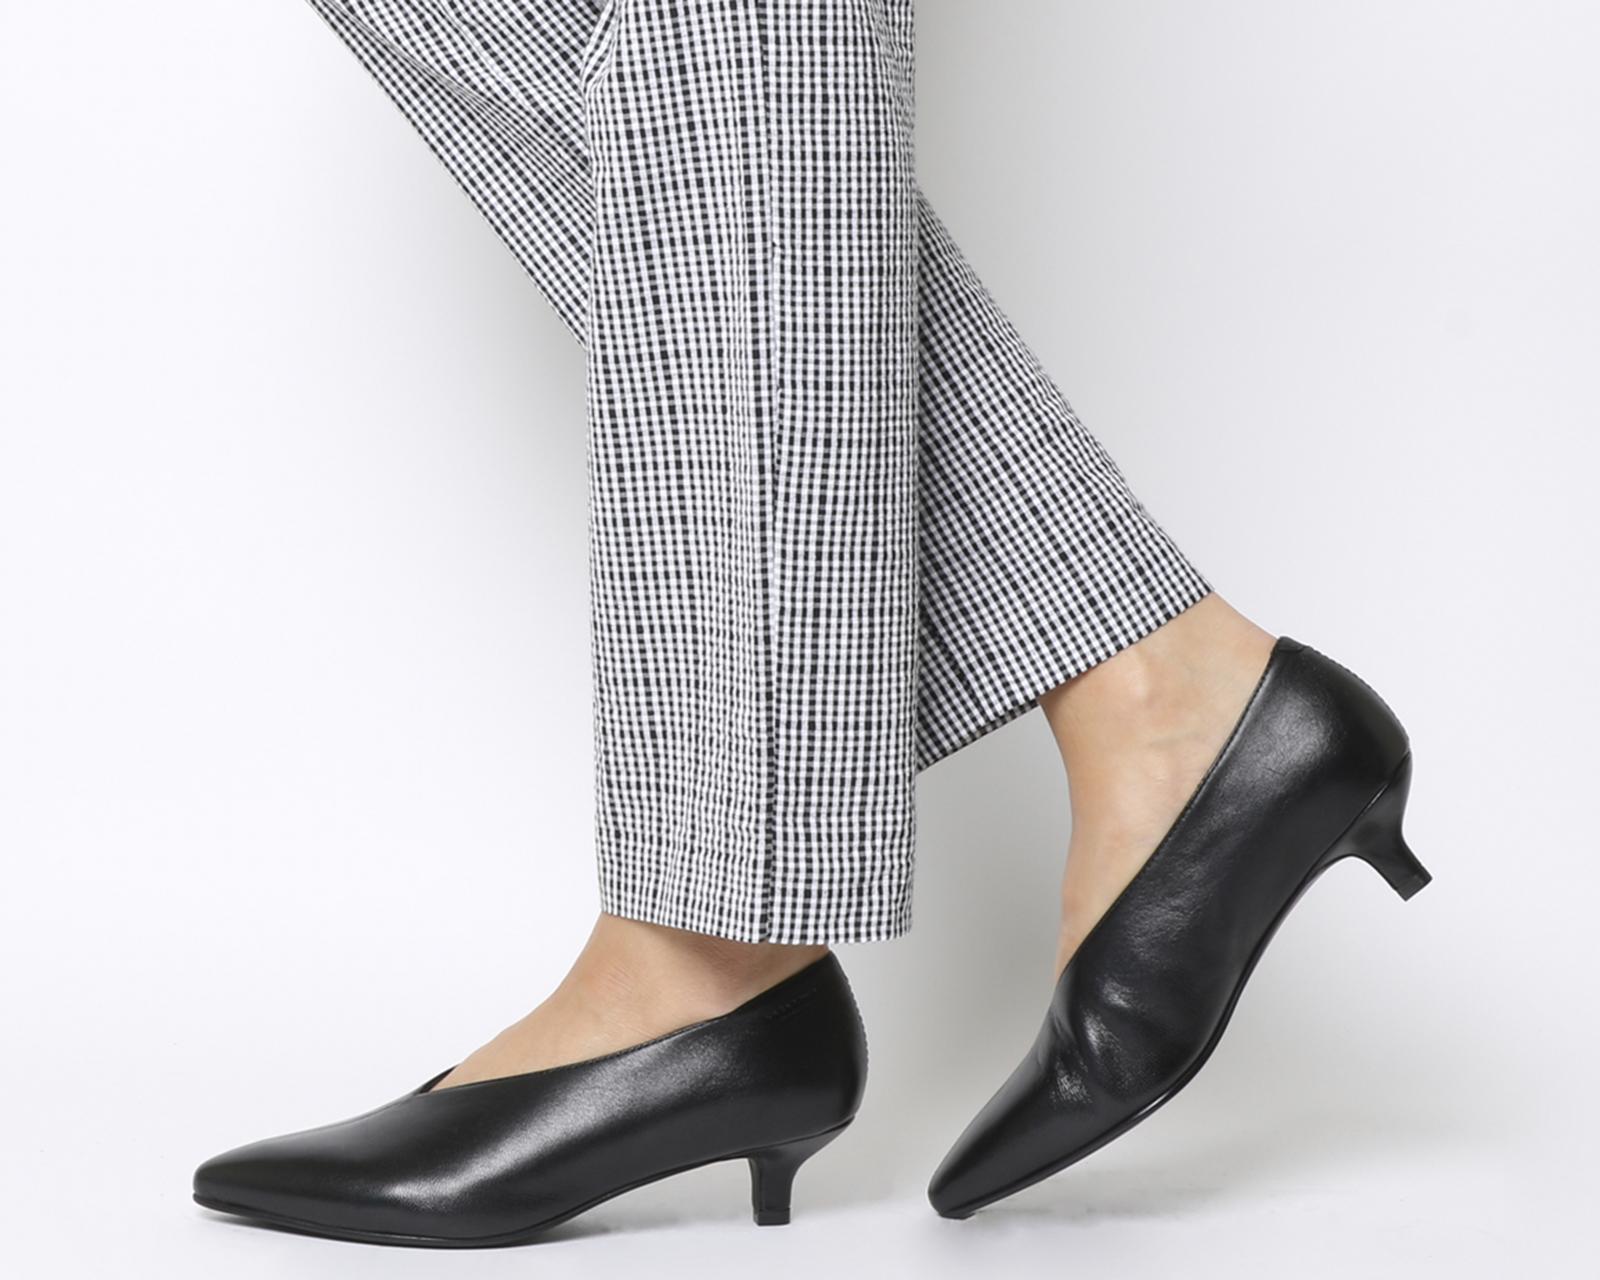 bc795ec6e61 Details about Womens Vagabond Minna Low Heels Black Leather Heels